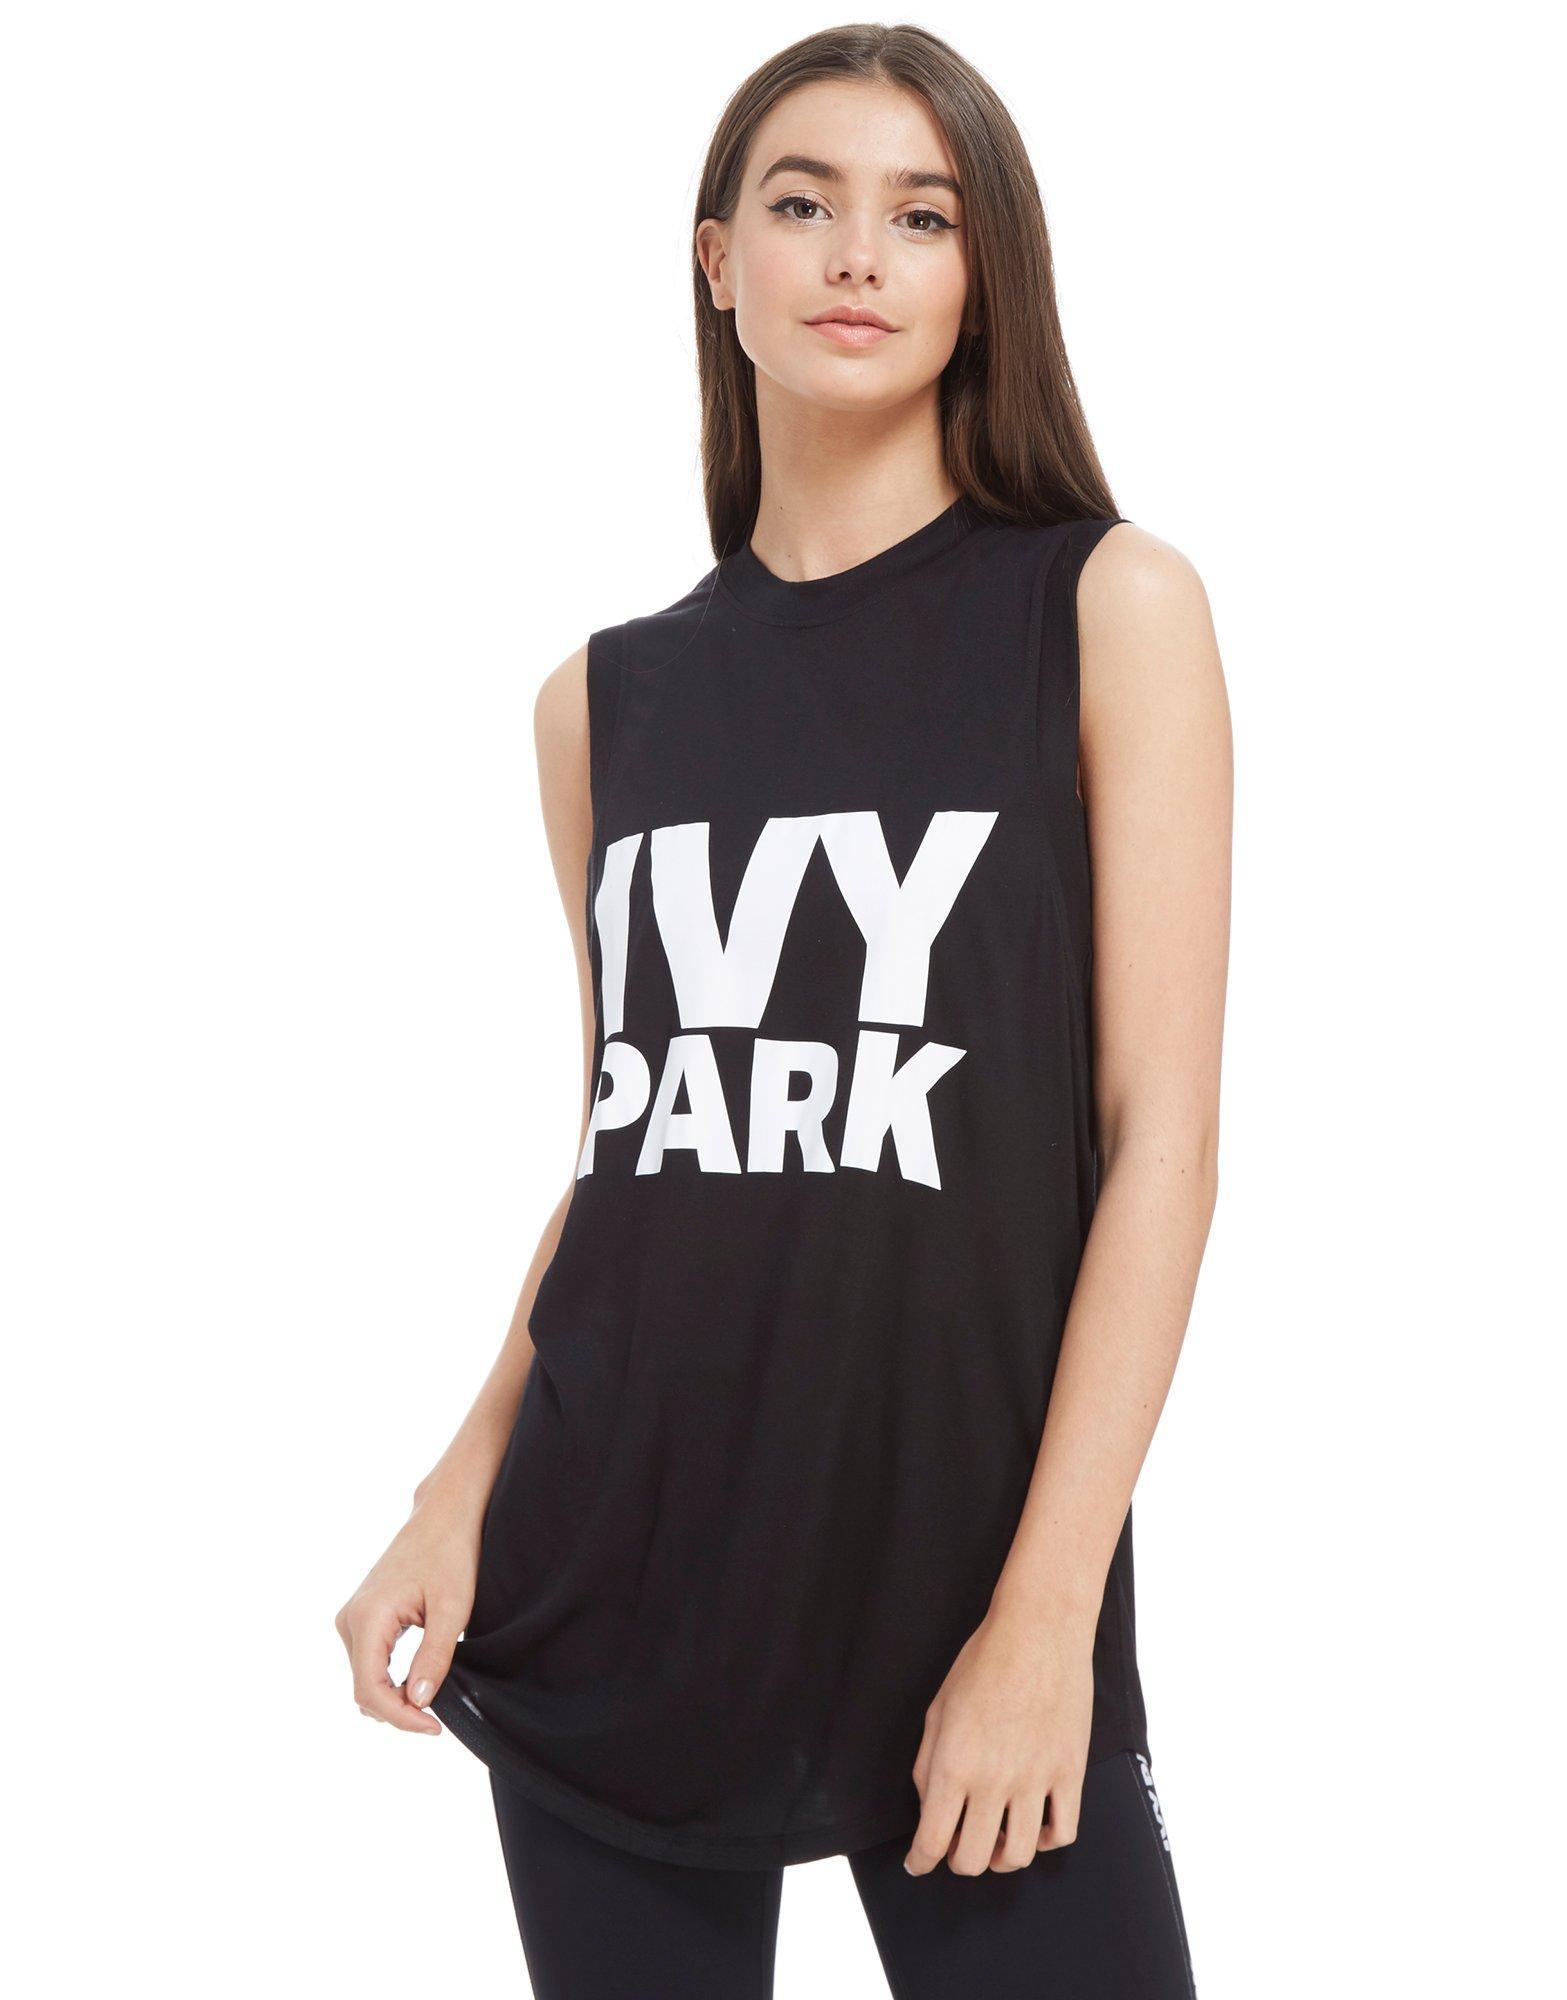 6f6eaf270f6db9 Lyst - Ivy Park Tank Top in Black